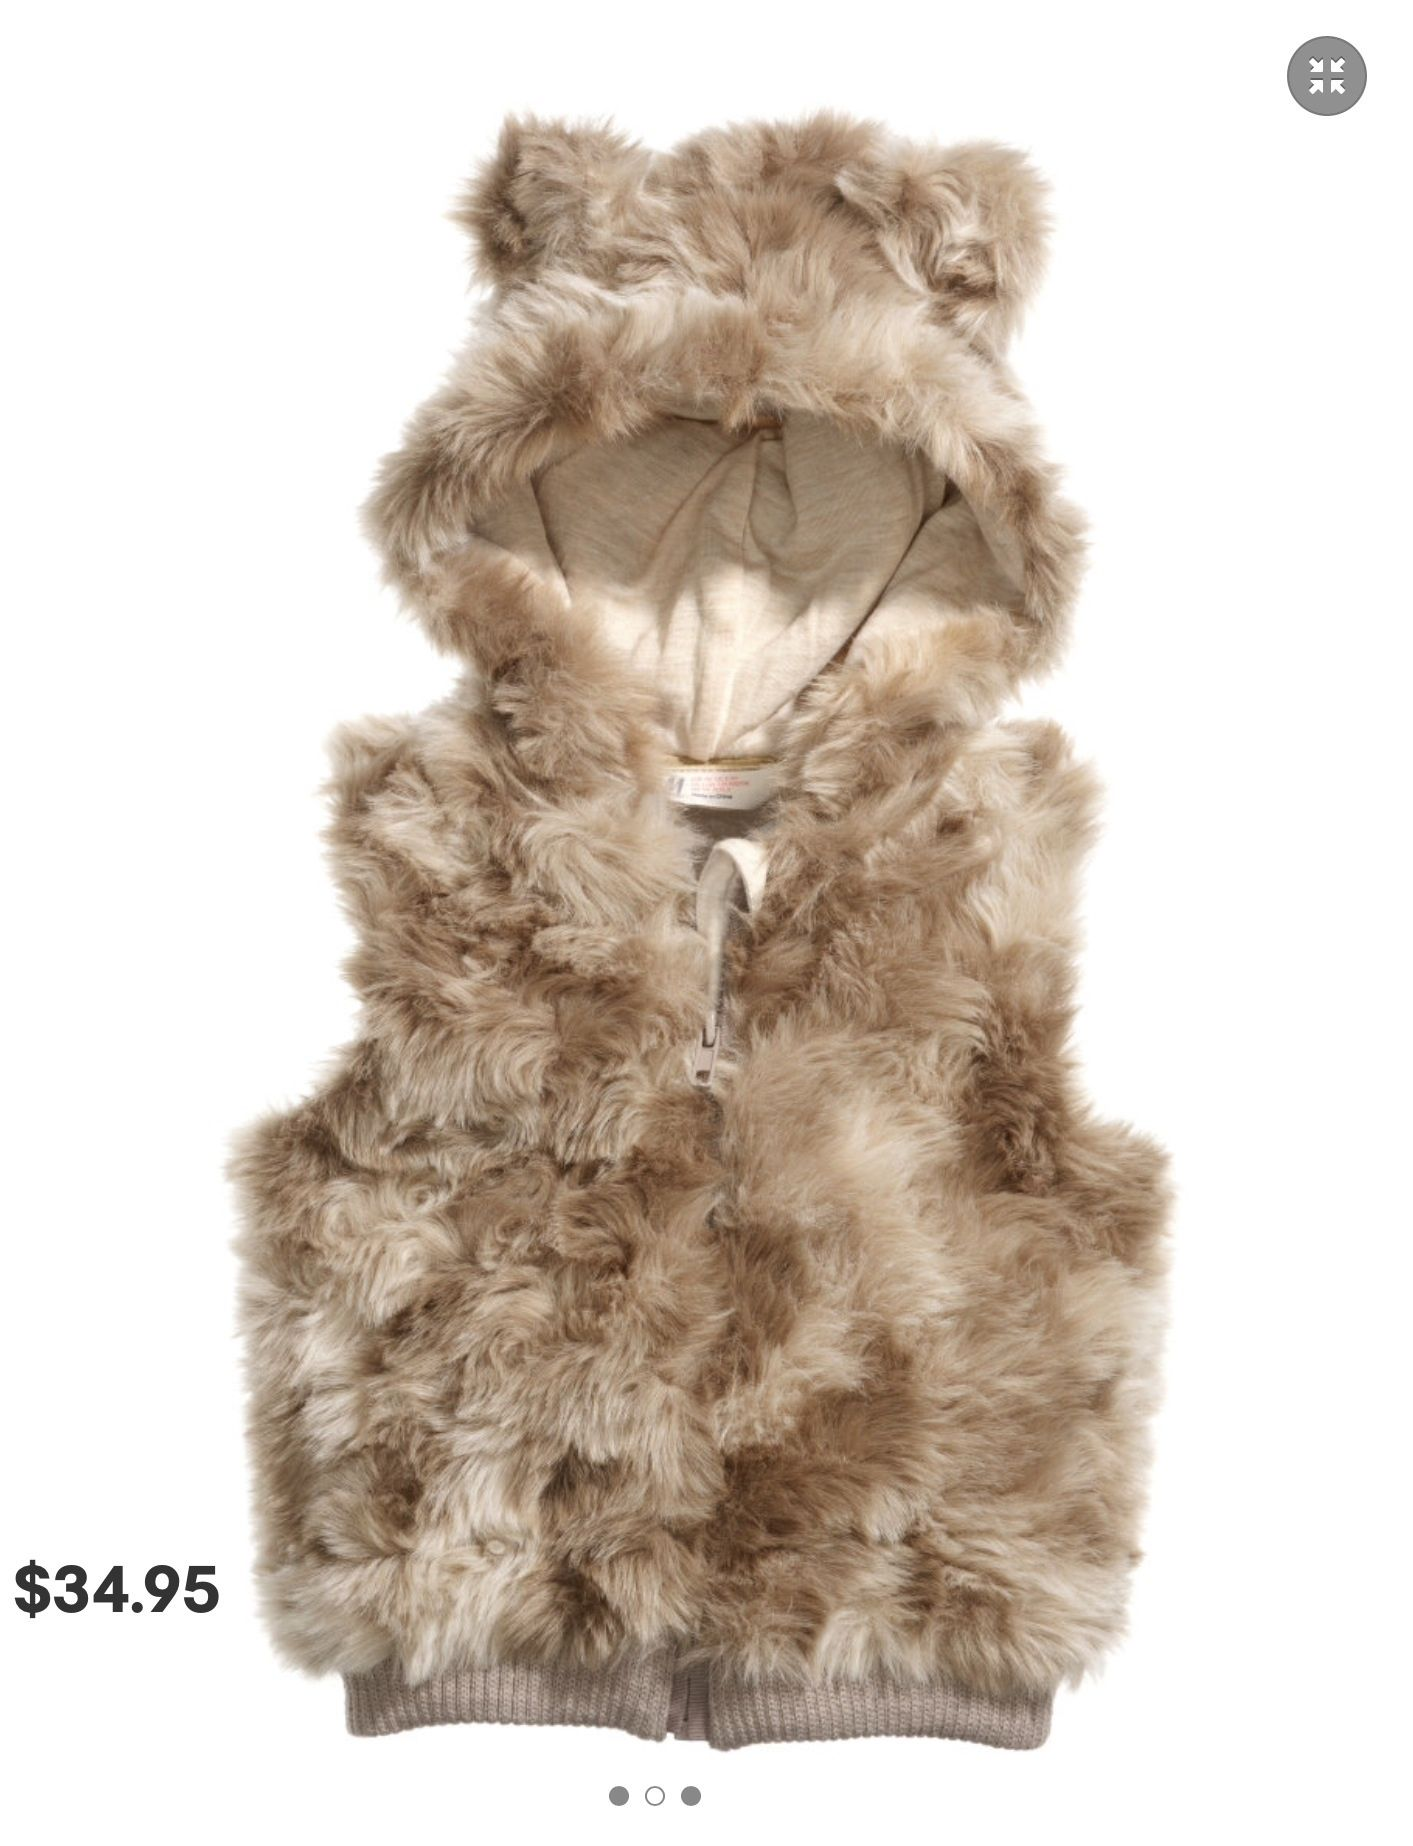 H&M Fake Waistcoat